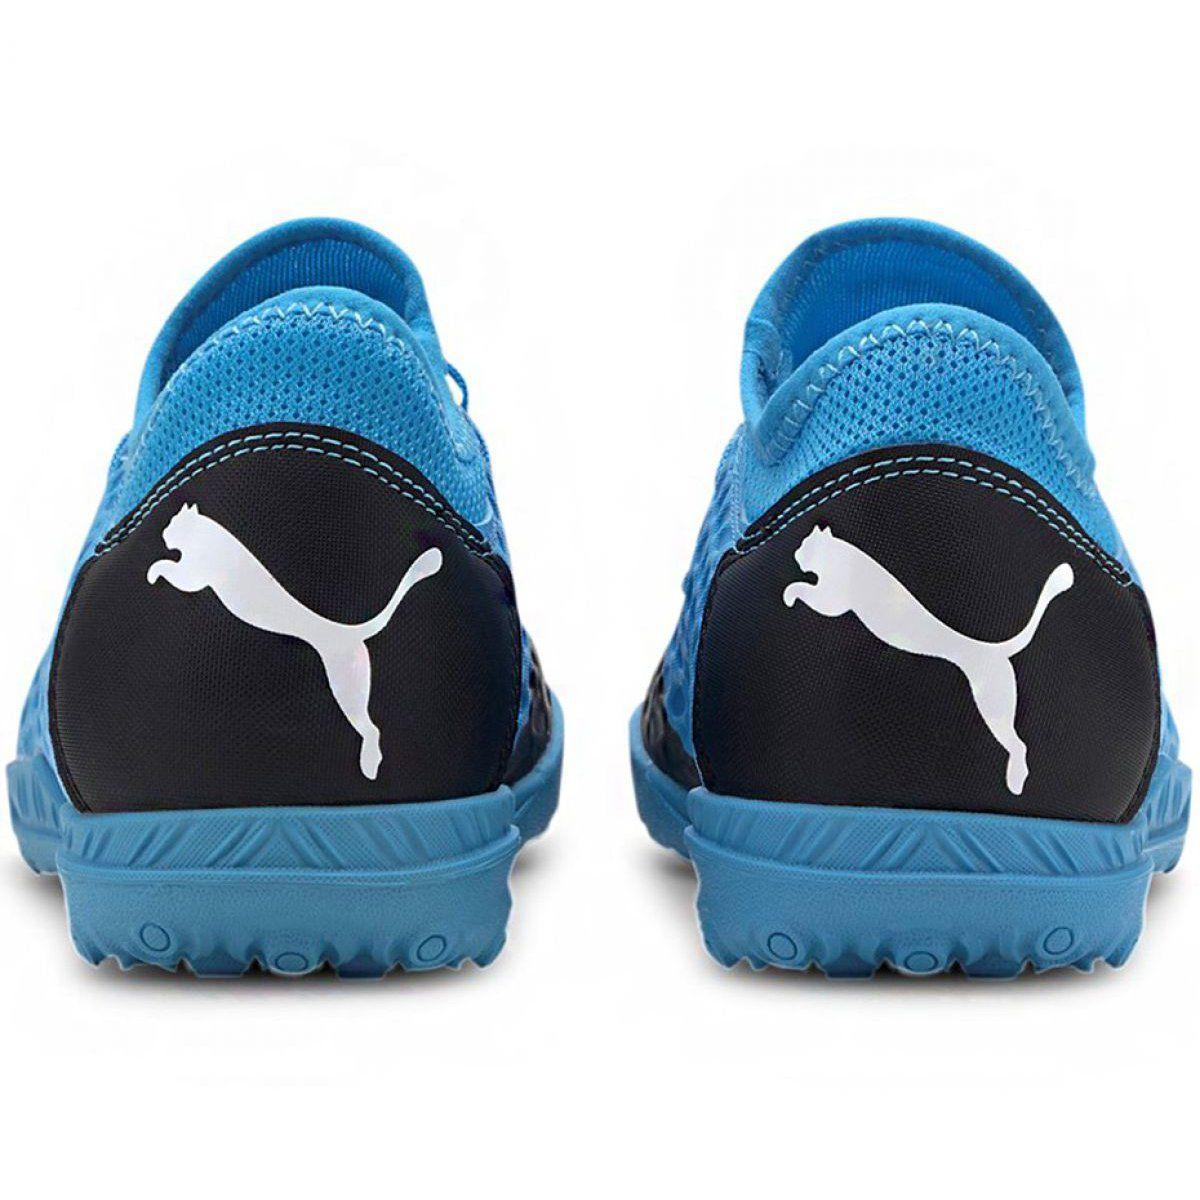 Buty Pilkarskie Puma Future 5 4 Tt Jr 105813 01 Niebieskie Niebieskie Football Shoes Soccer Boots Blue Shoes